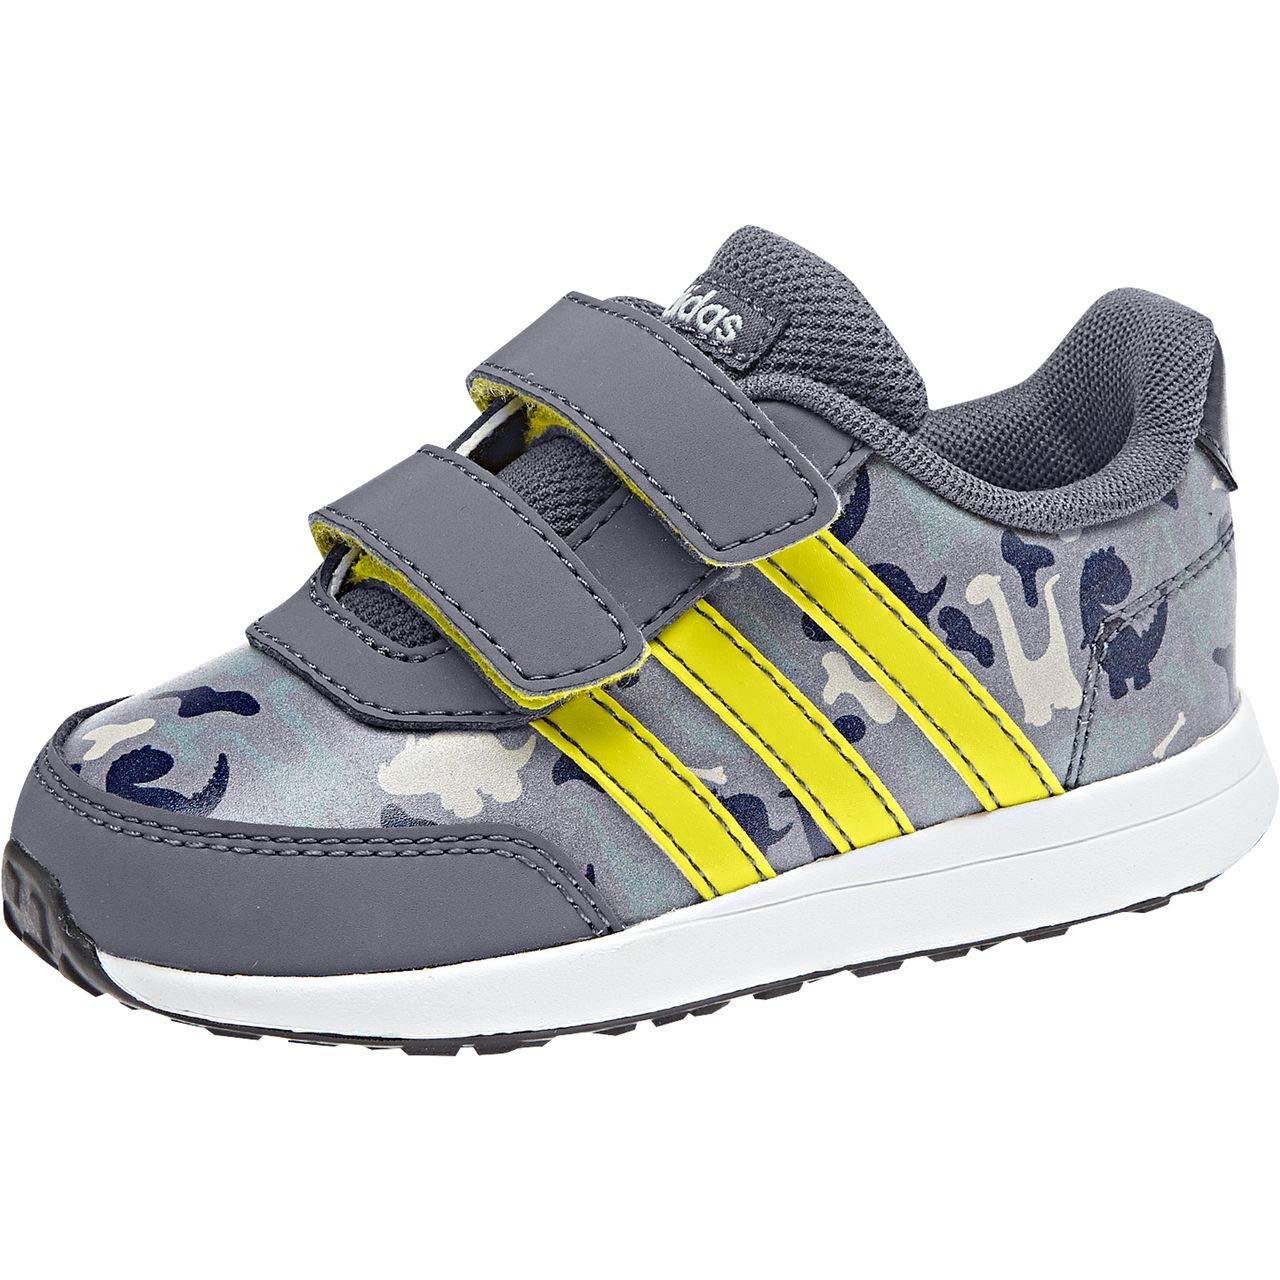 6478264e adidas Unisex Babies' Vs Switch 2 CMF Inf Trainers: Amazon ...